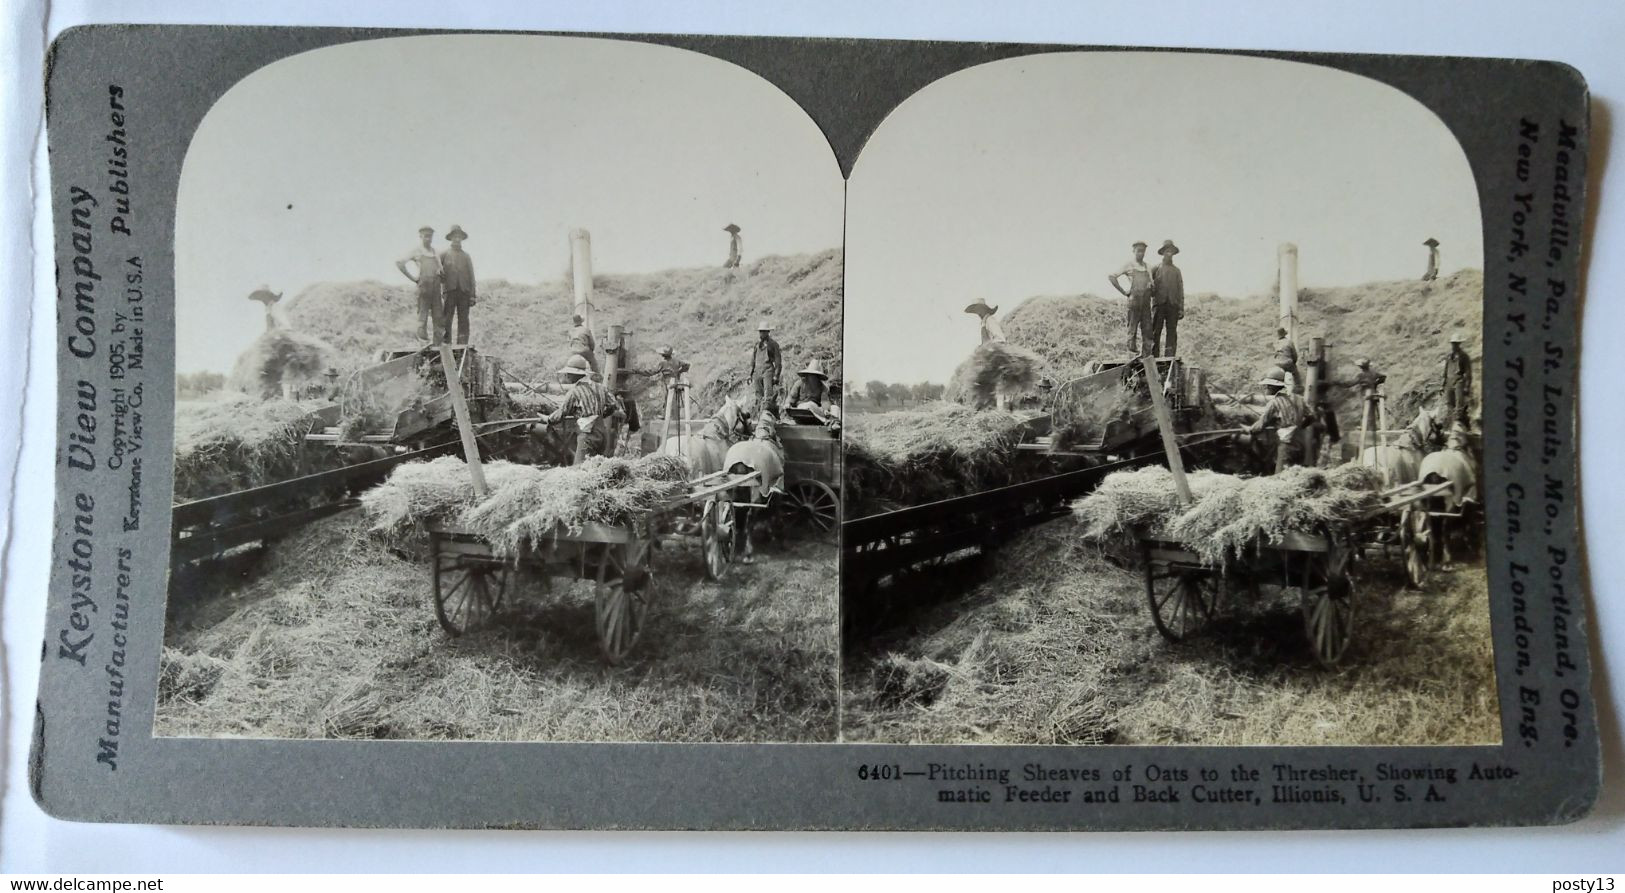 PHOTO STÉRÉO USA -  Travail Agricole - Récolte Des Gerbes D'avoine - A Voir ! -  1905 -  Ed. Keystone - TBE - Stereoscopio